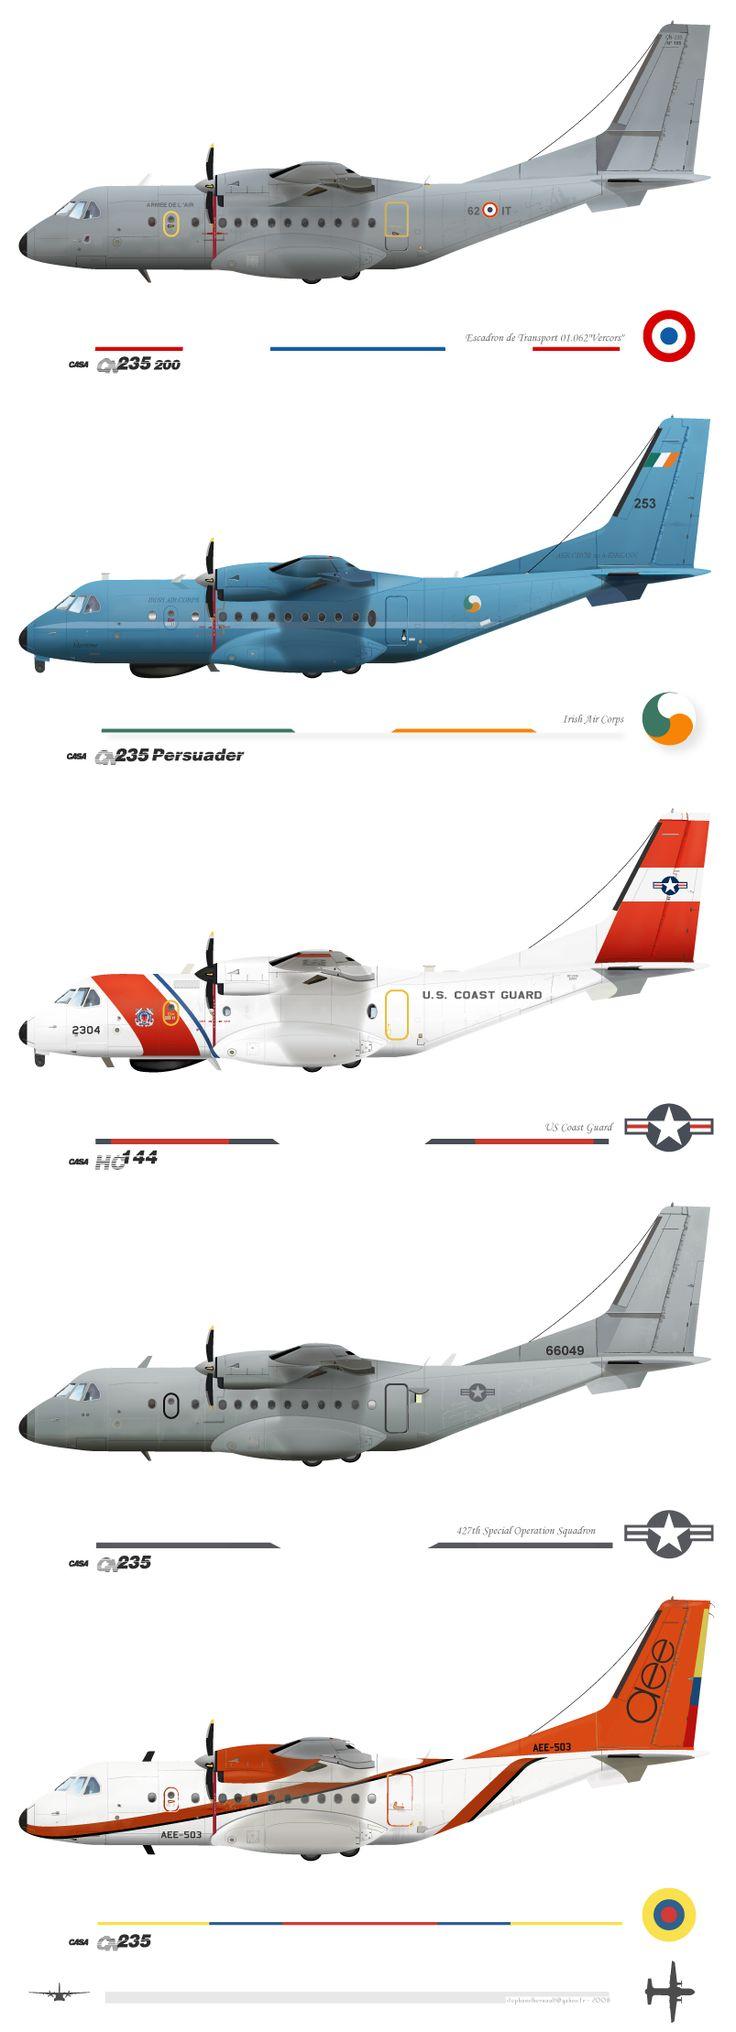 CN-235 worldwide livery